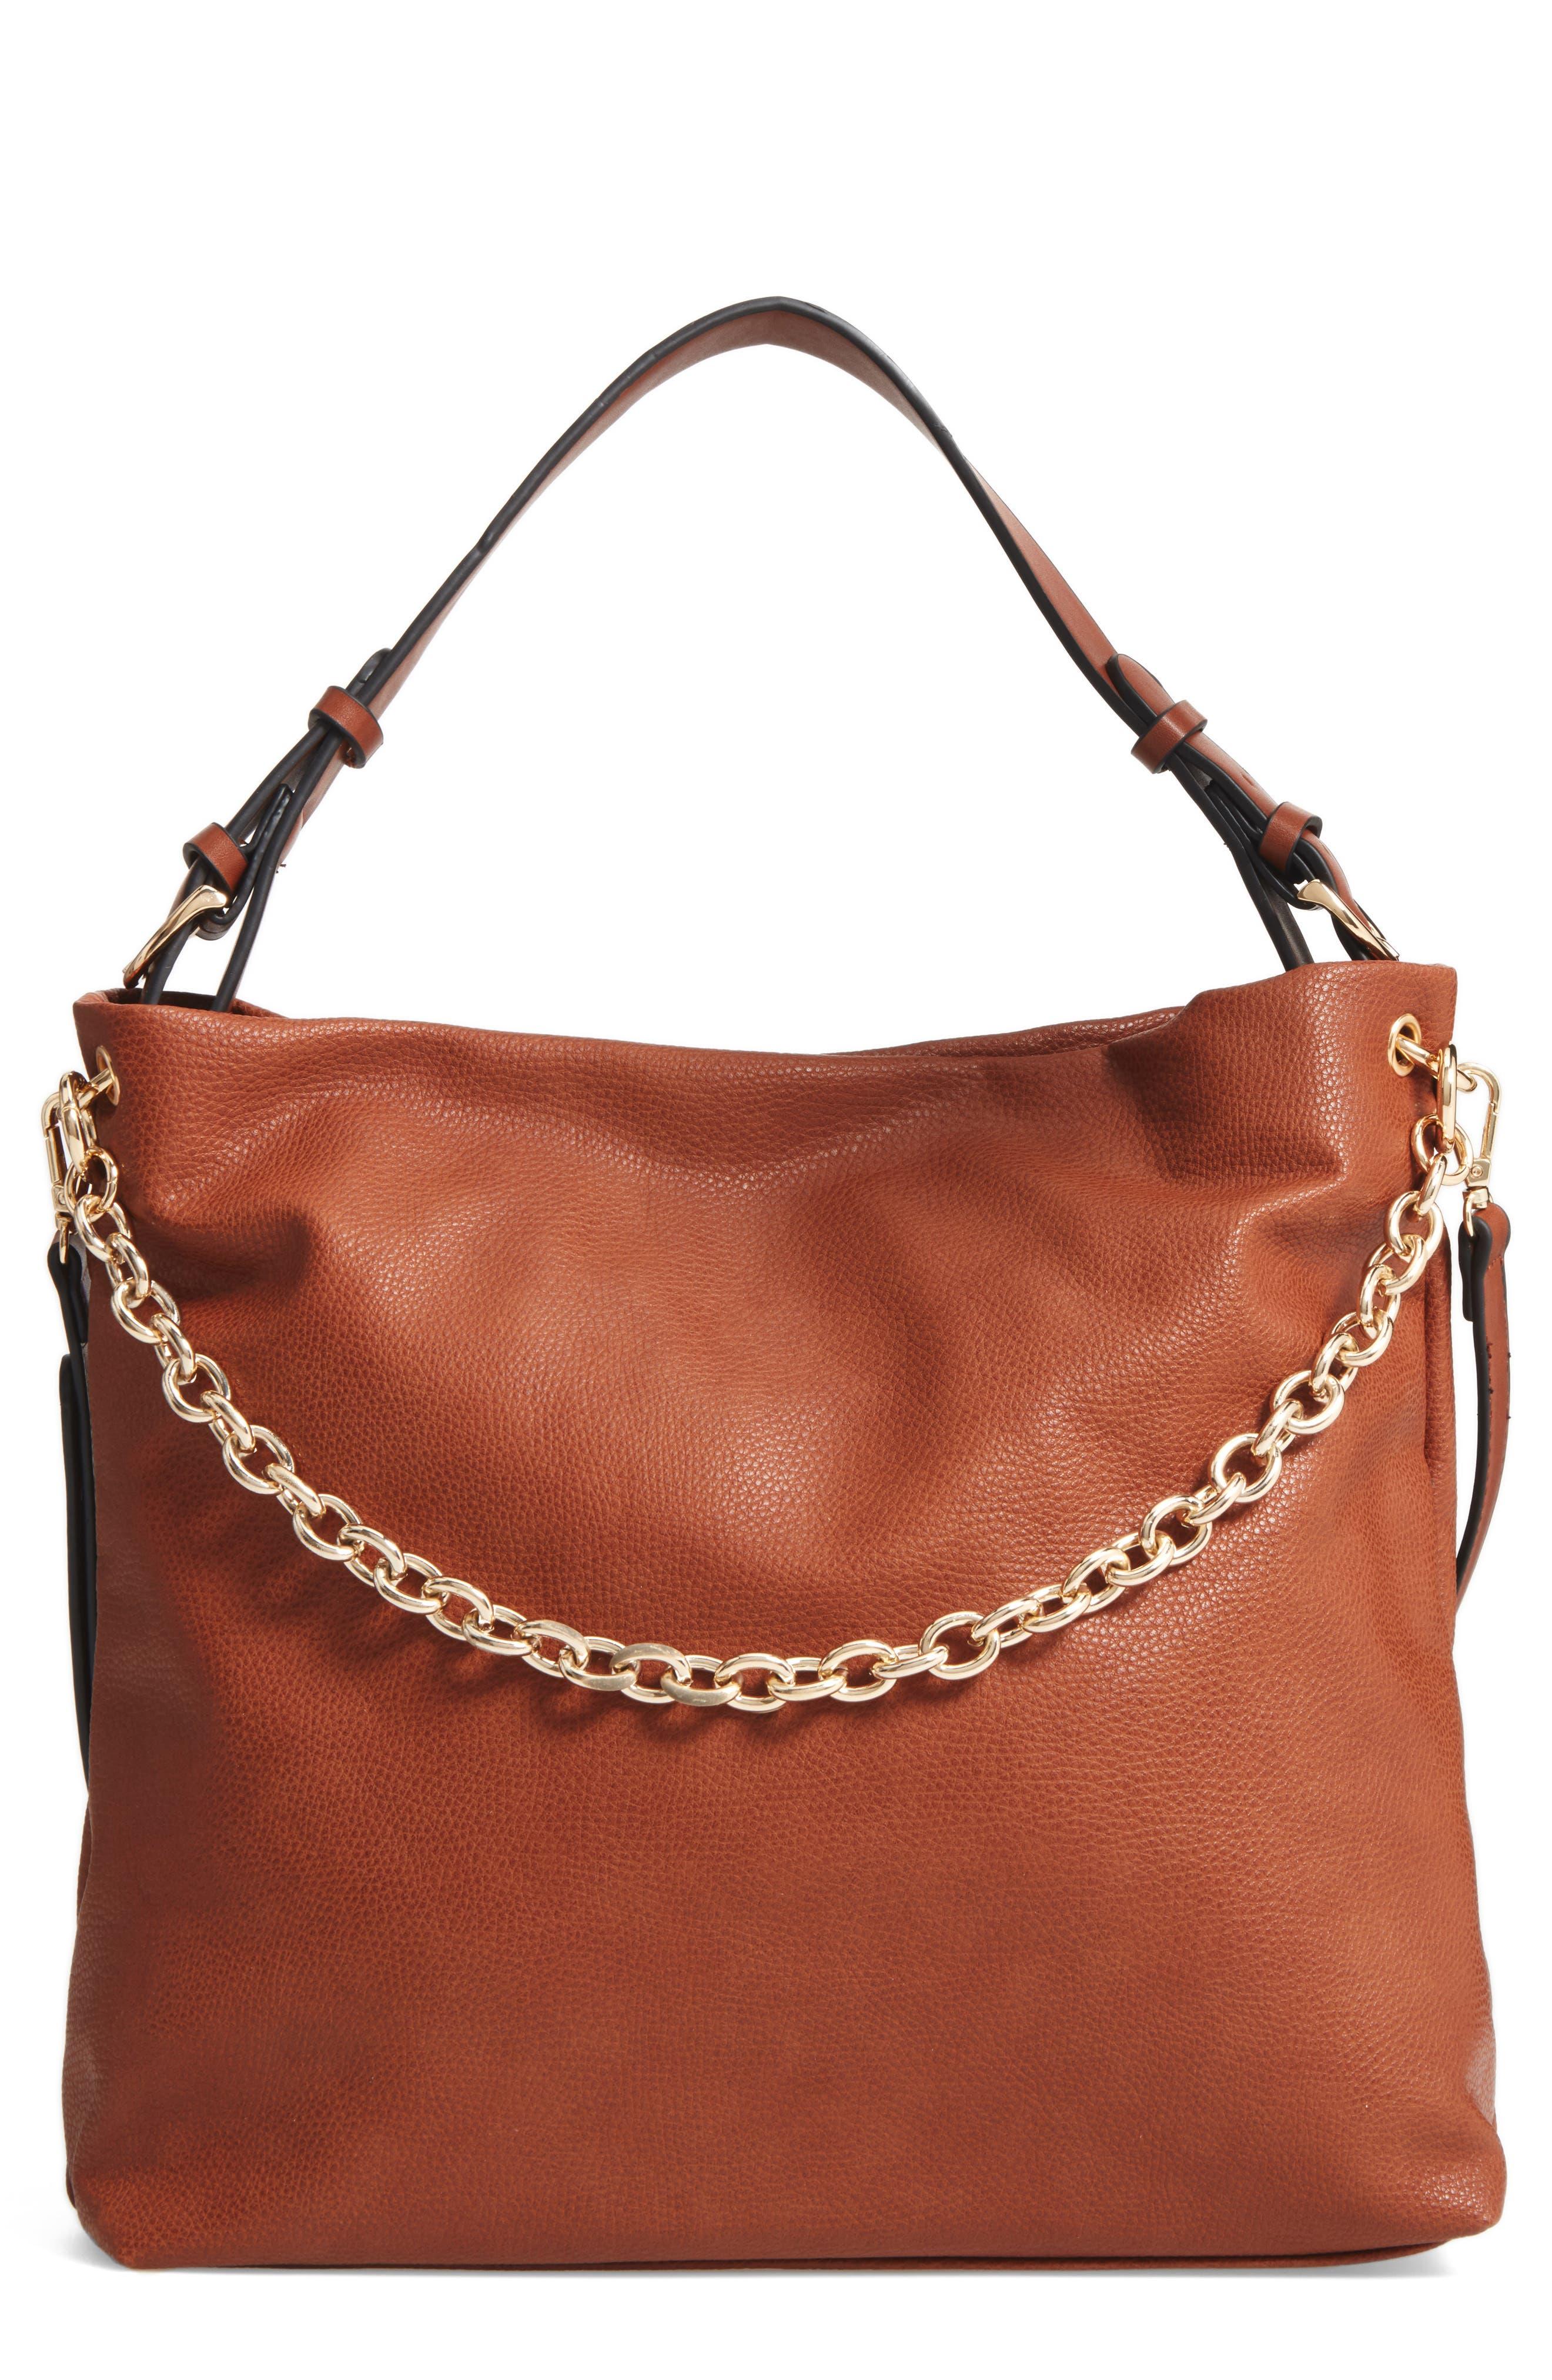 Chelsea28 Taylor Faux Leather Shoulder Bag